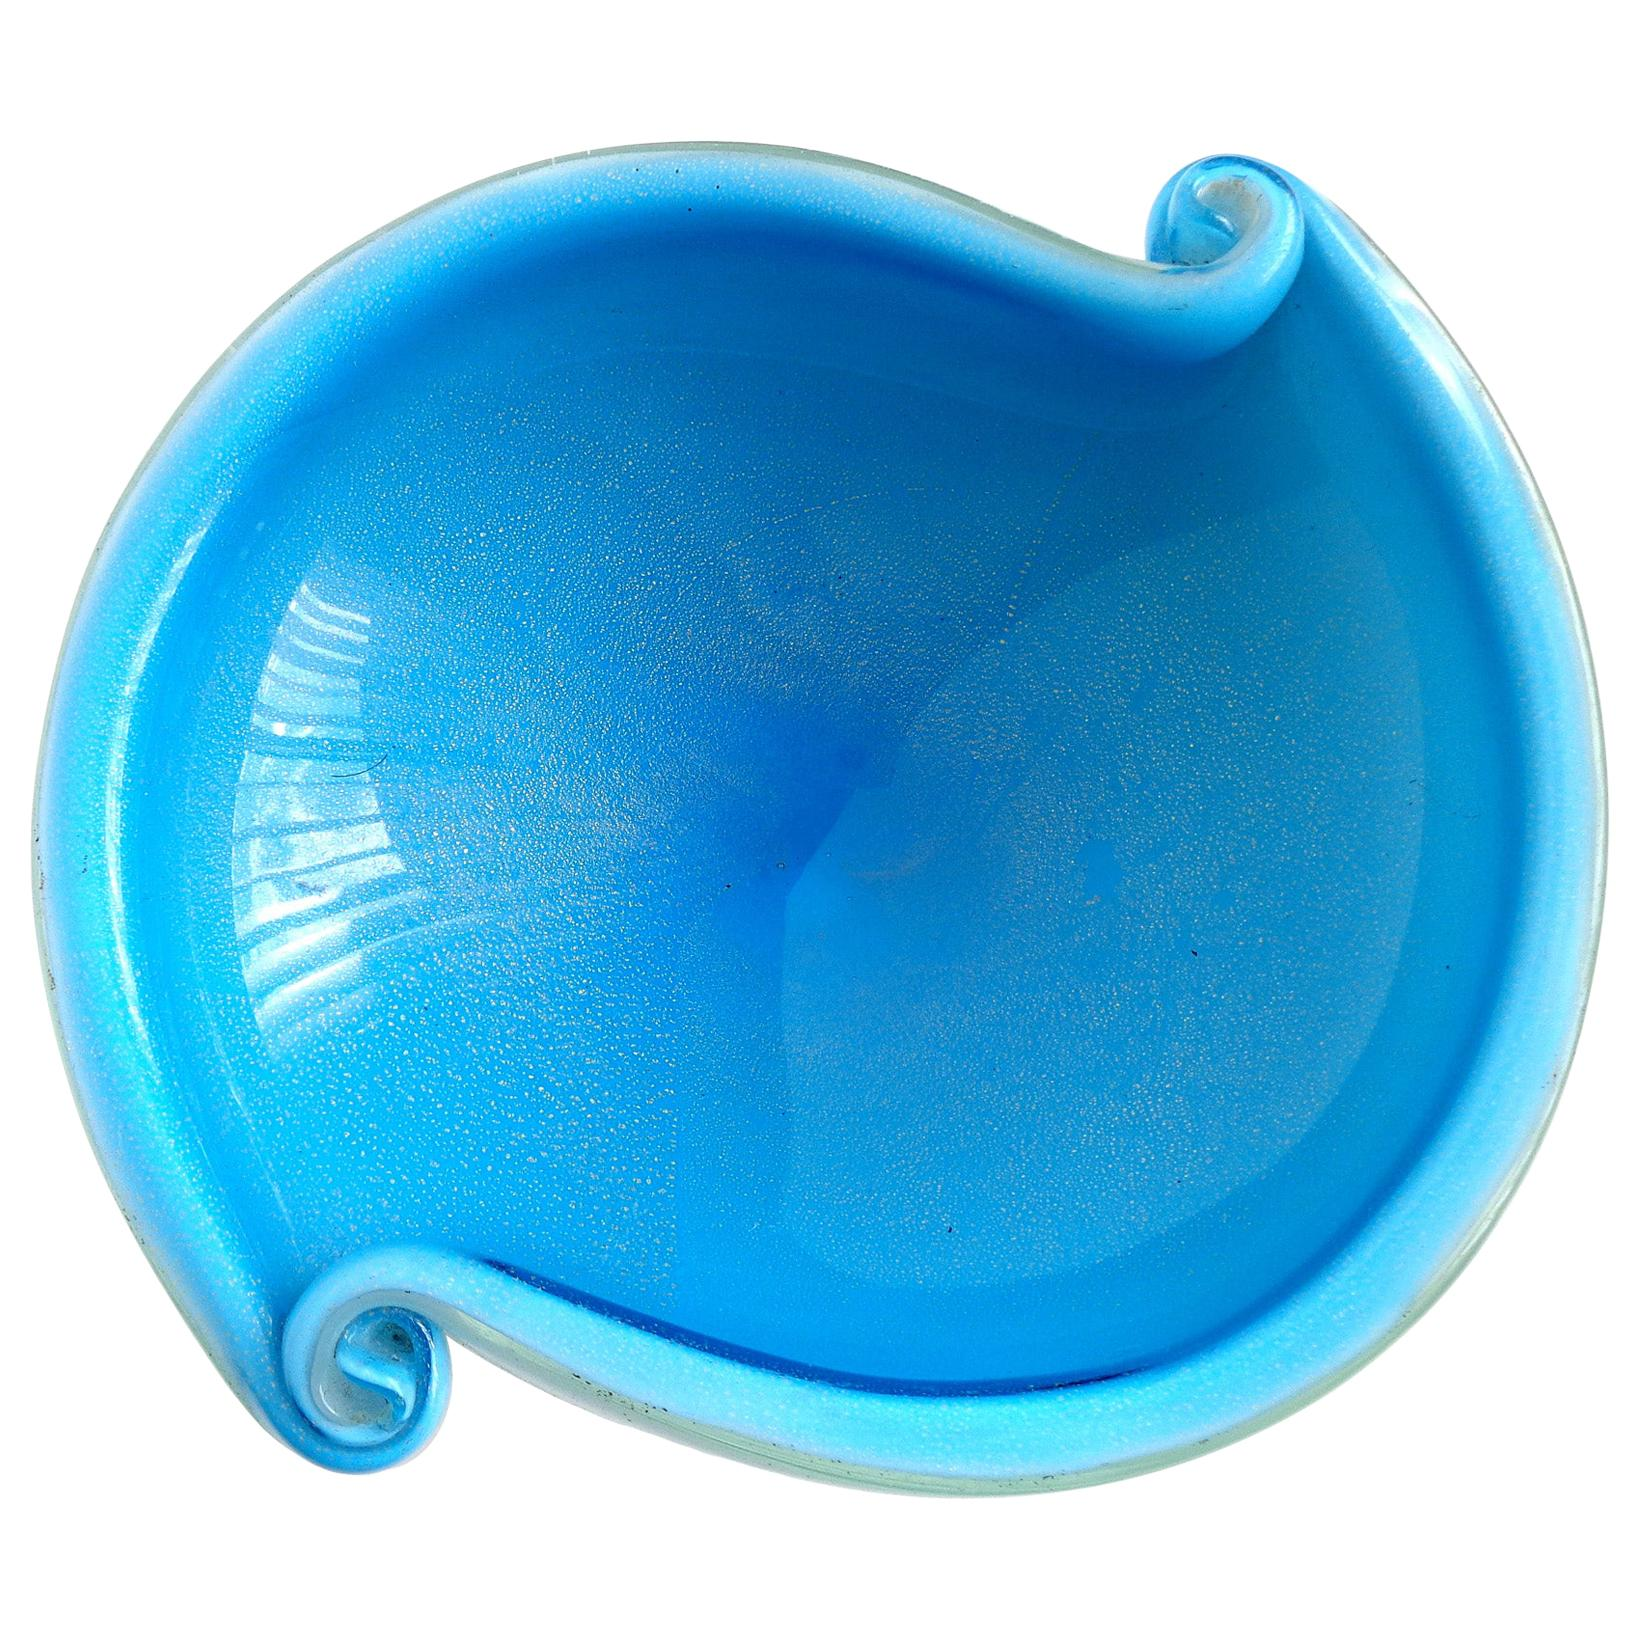 Murano Cobalt Blue White Gold Flecks Italian Art Glass Scroll Shell Bowl Dish